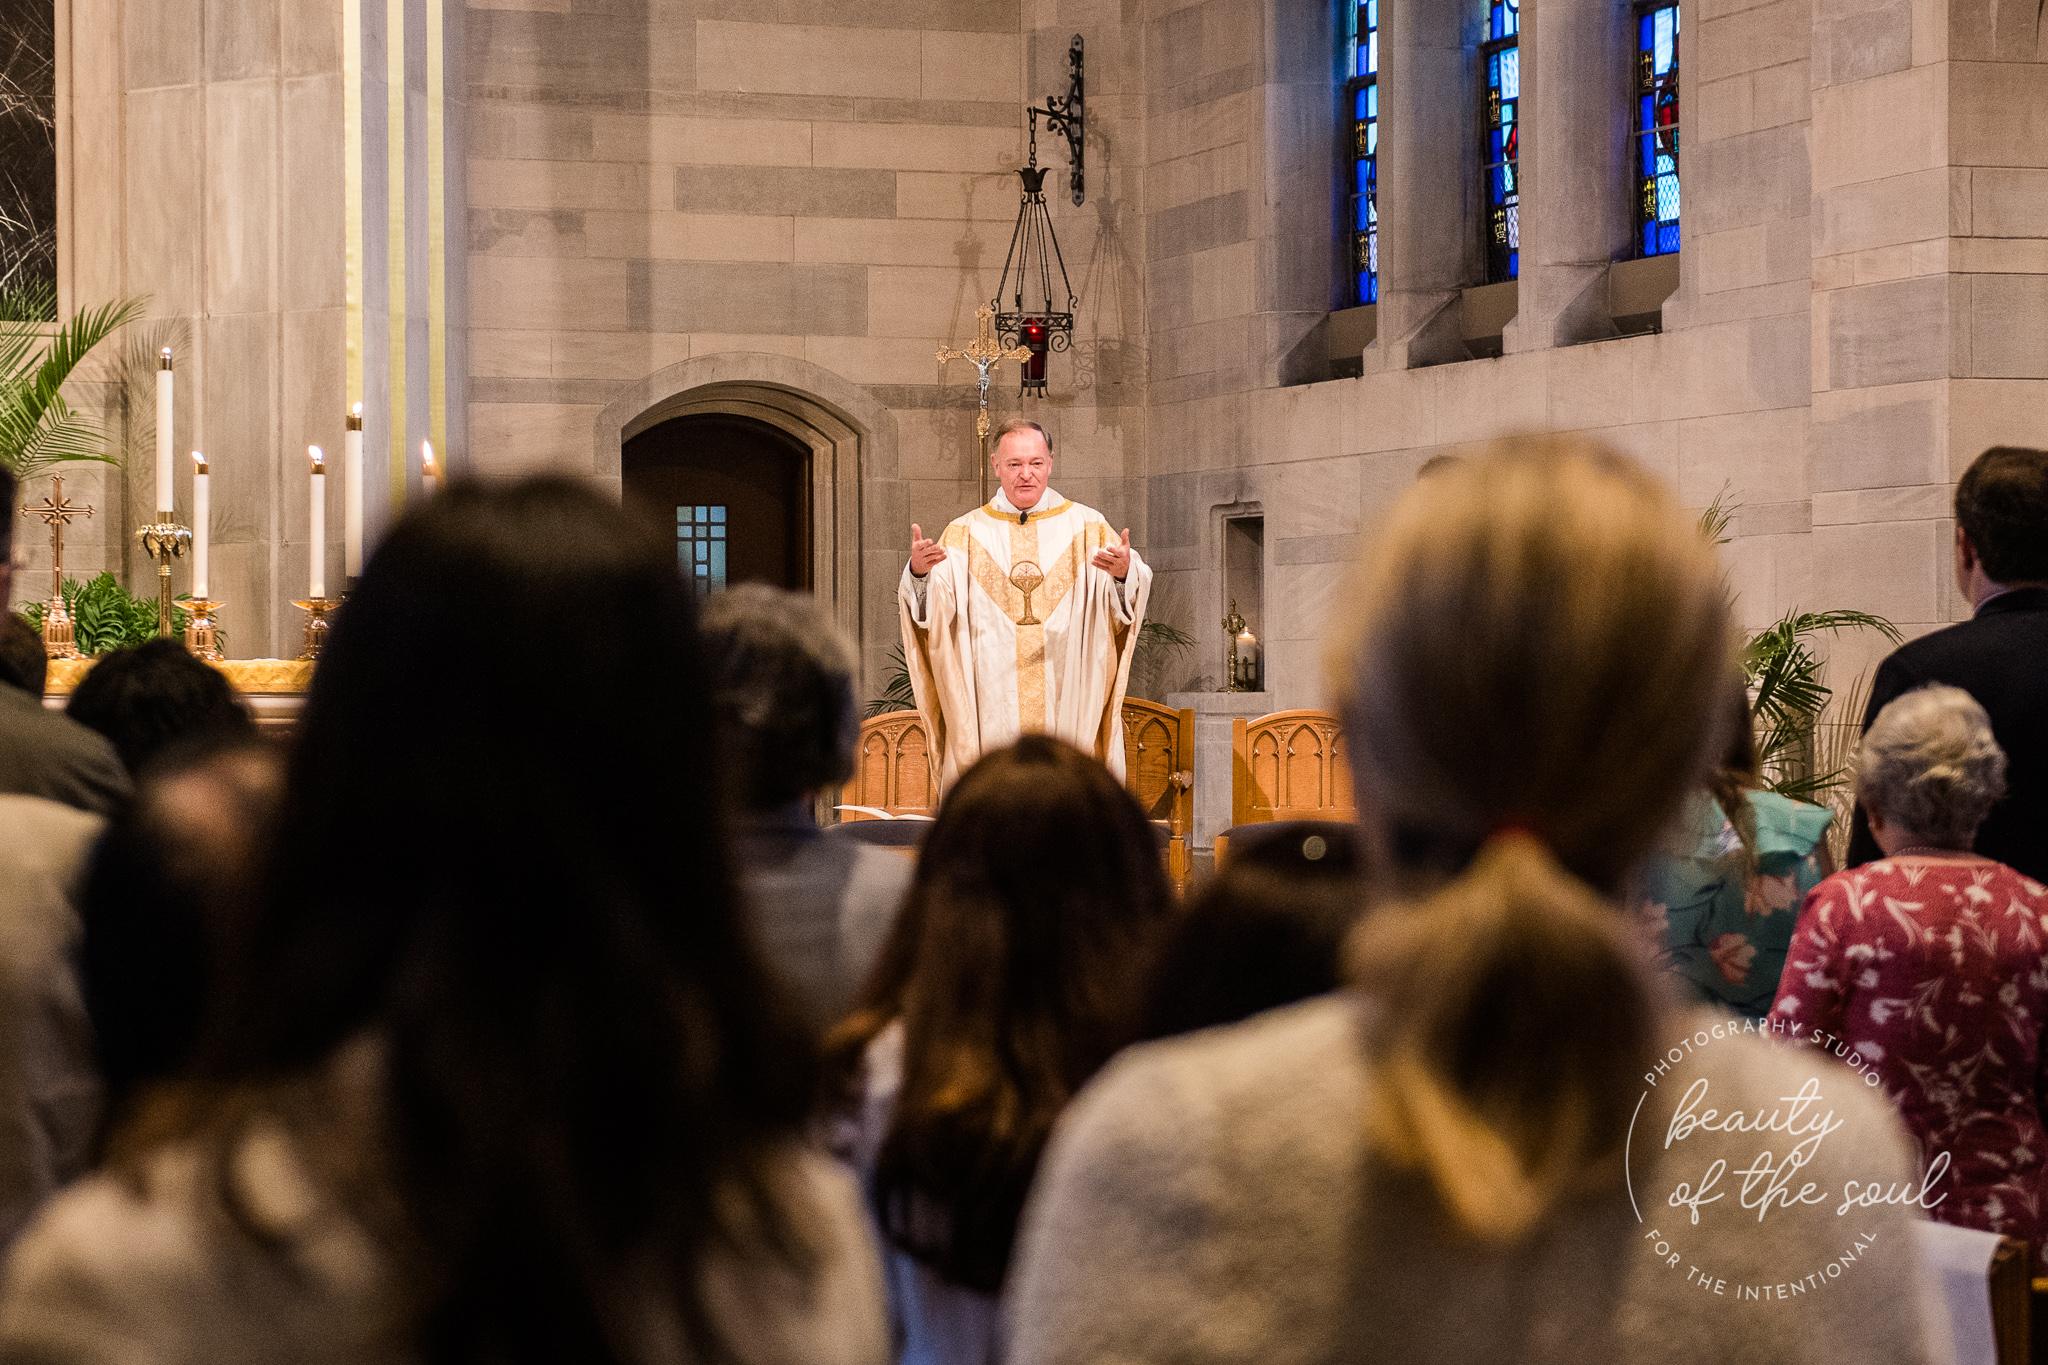 washington-dc-st-ann-catholic-church-first-holy-communion-beauty-of-the-soul-studio-may-2019-04.jpg